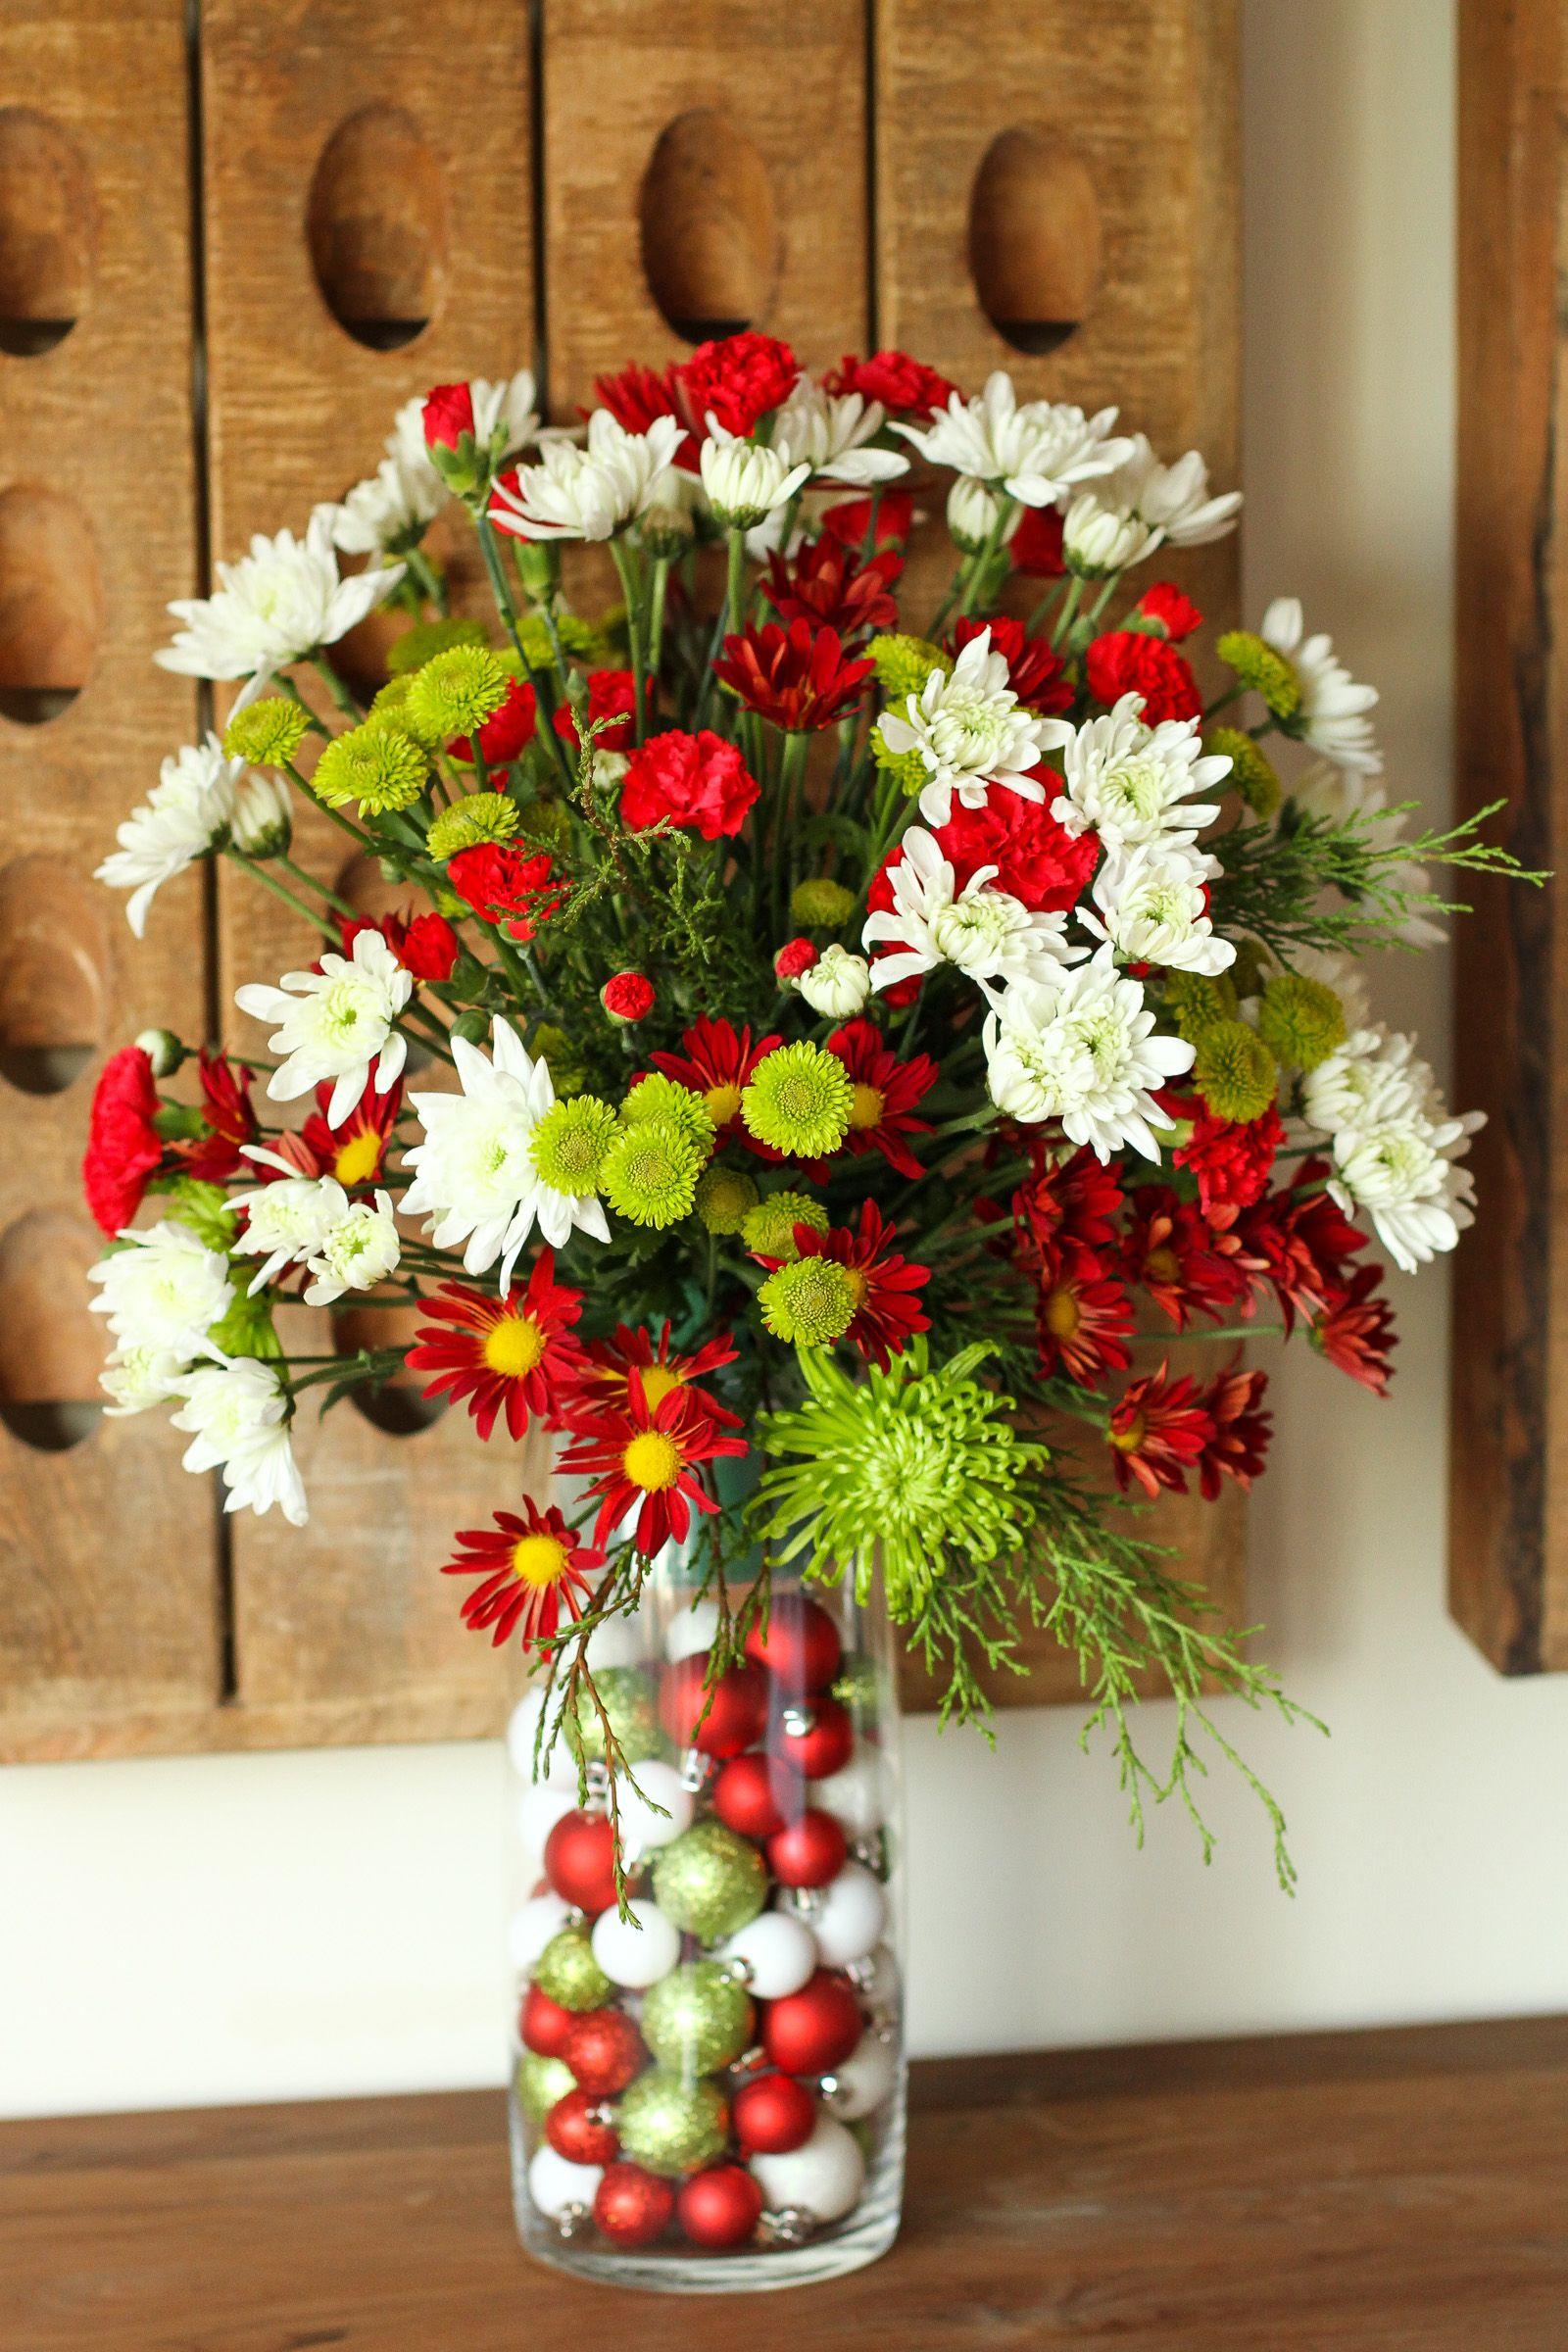 Easy Flower Arrangement DIY creating a custom floral